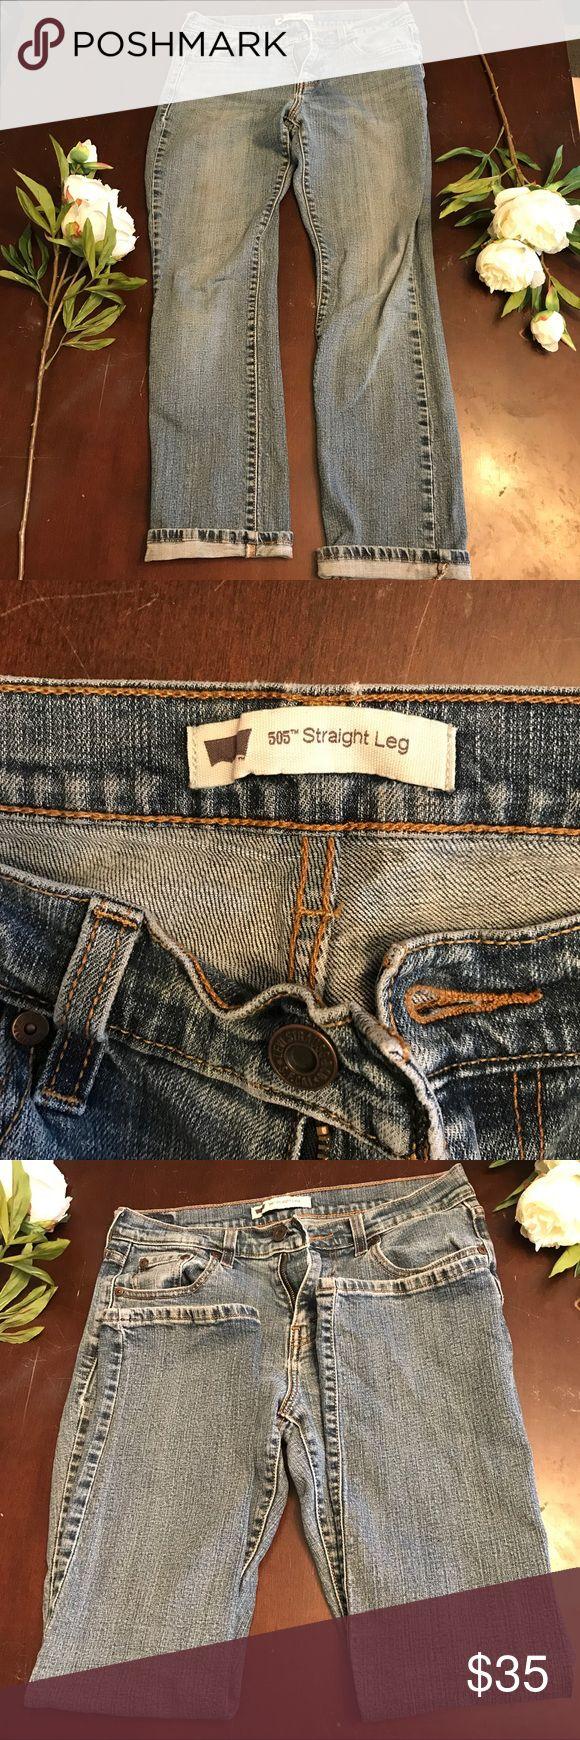 Levi's 505 Jeans Rare Levi's 505 Jeans Levi's Jeans